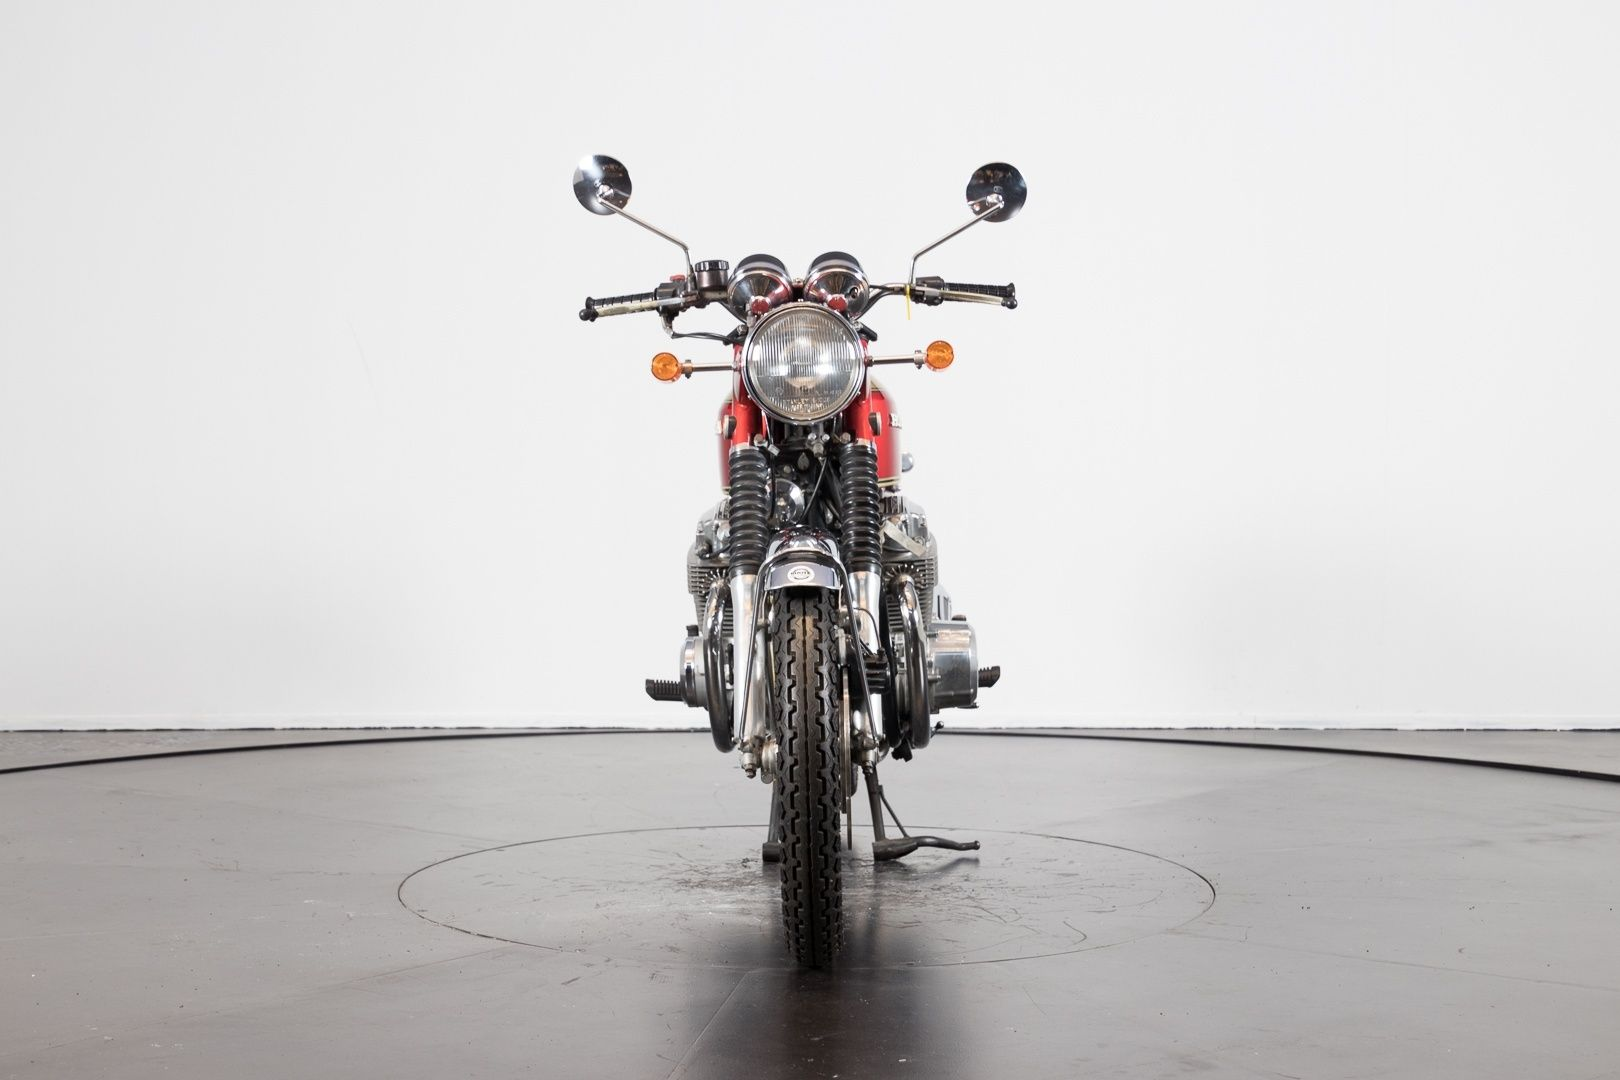 1971 Honda Motorcycles CB 750 Four | HONDA CB750 FORE 1969-1974 ...